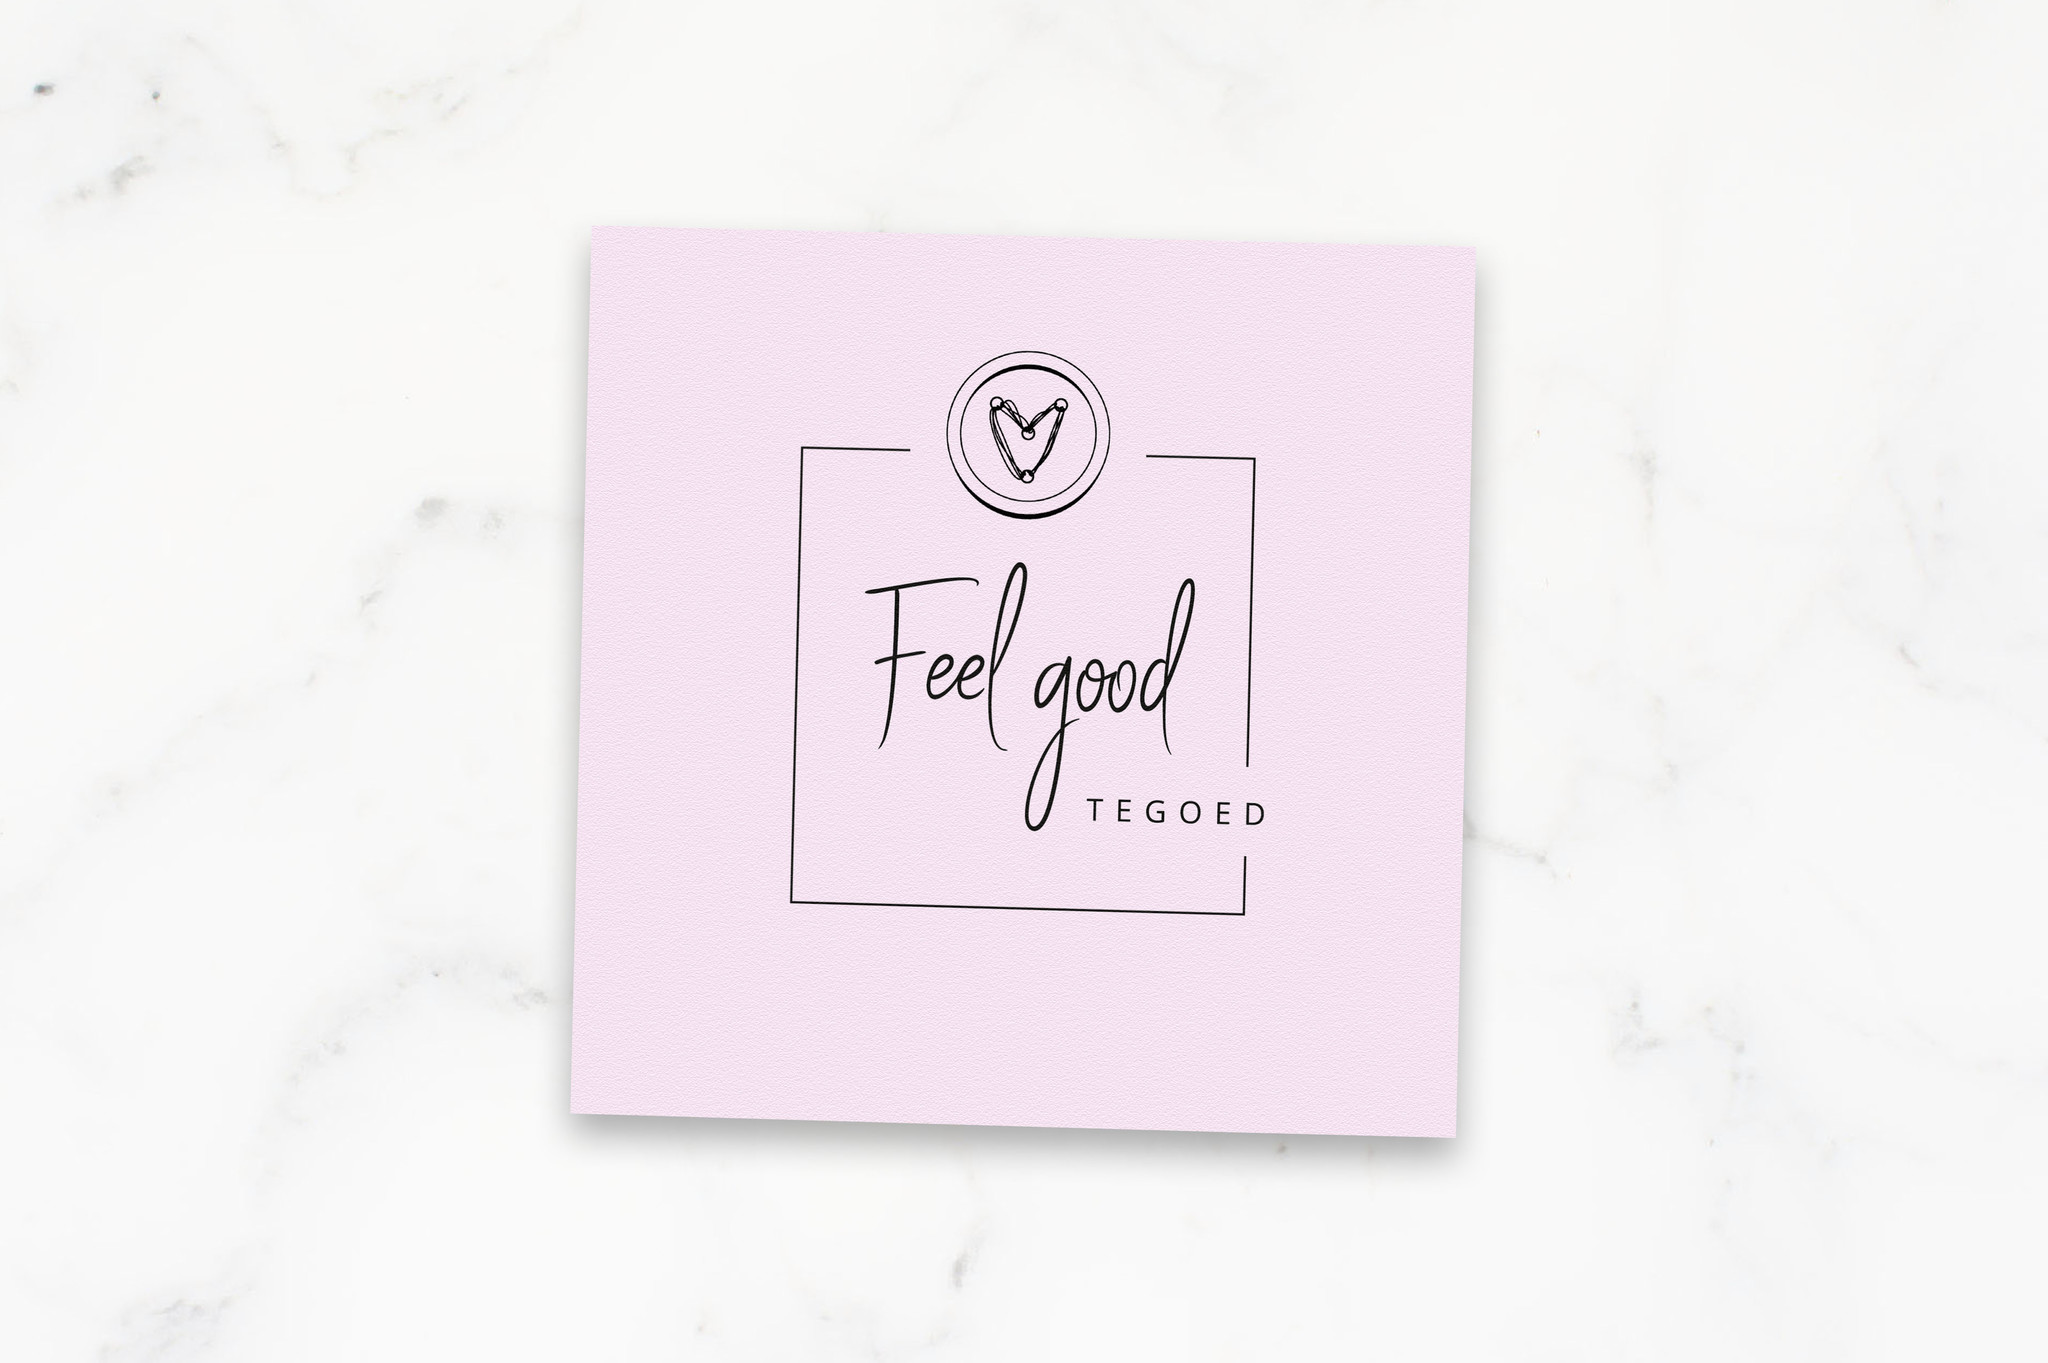 Feel Good Tegoed 'in je mailbox' 45 euro